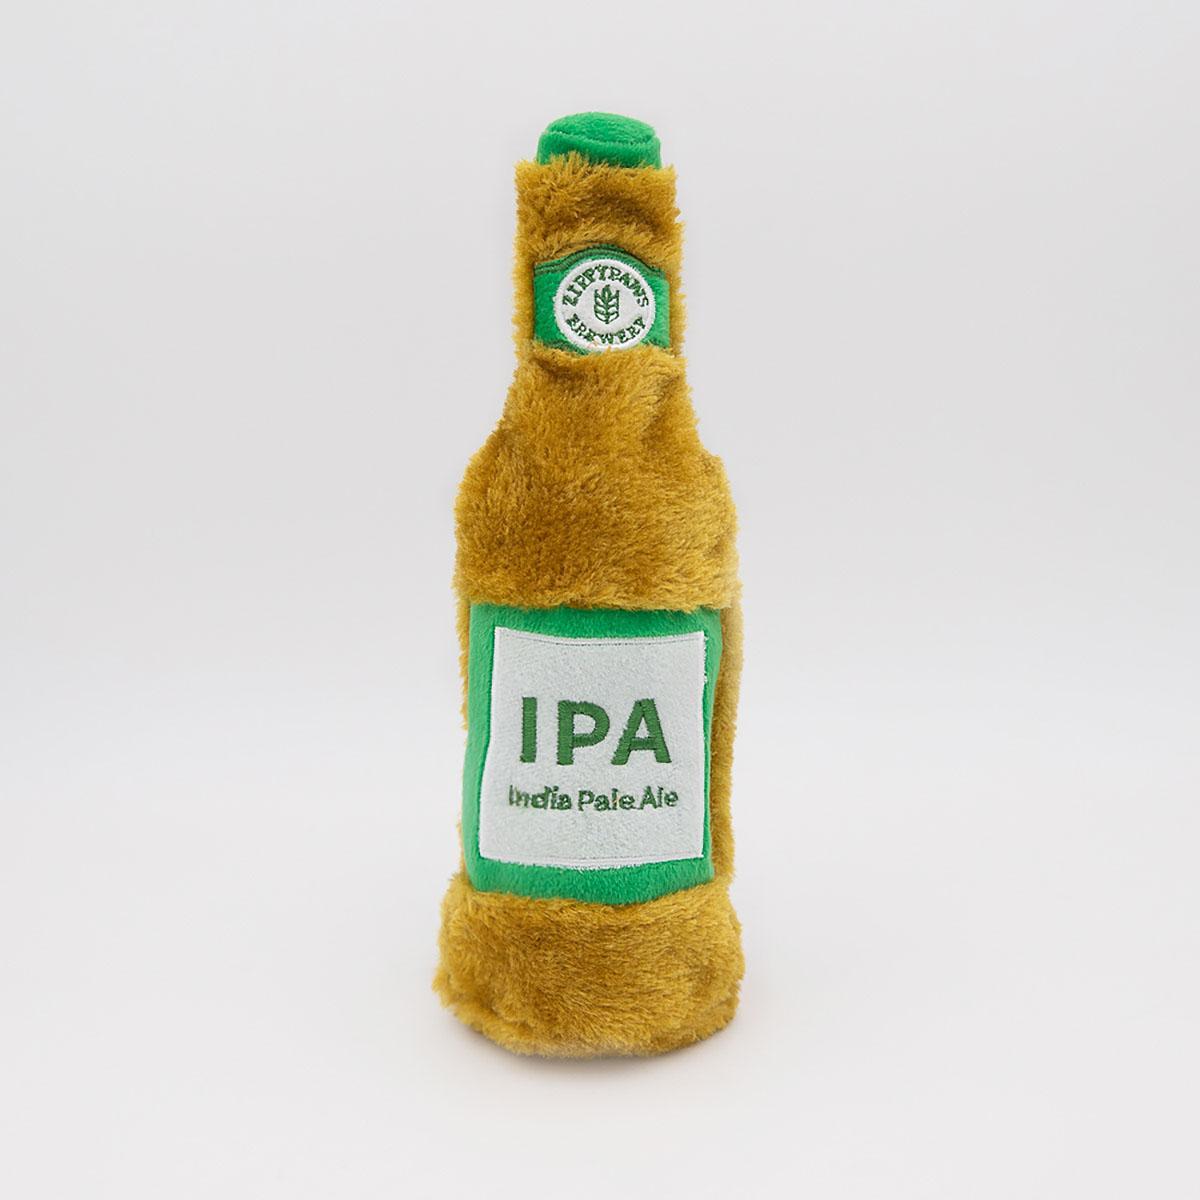 ZippyPaws Happy Hour Crusherz Dog Toy - IPA